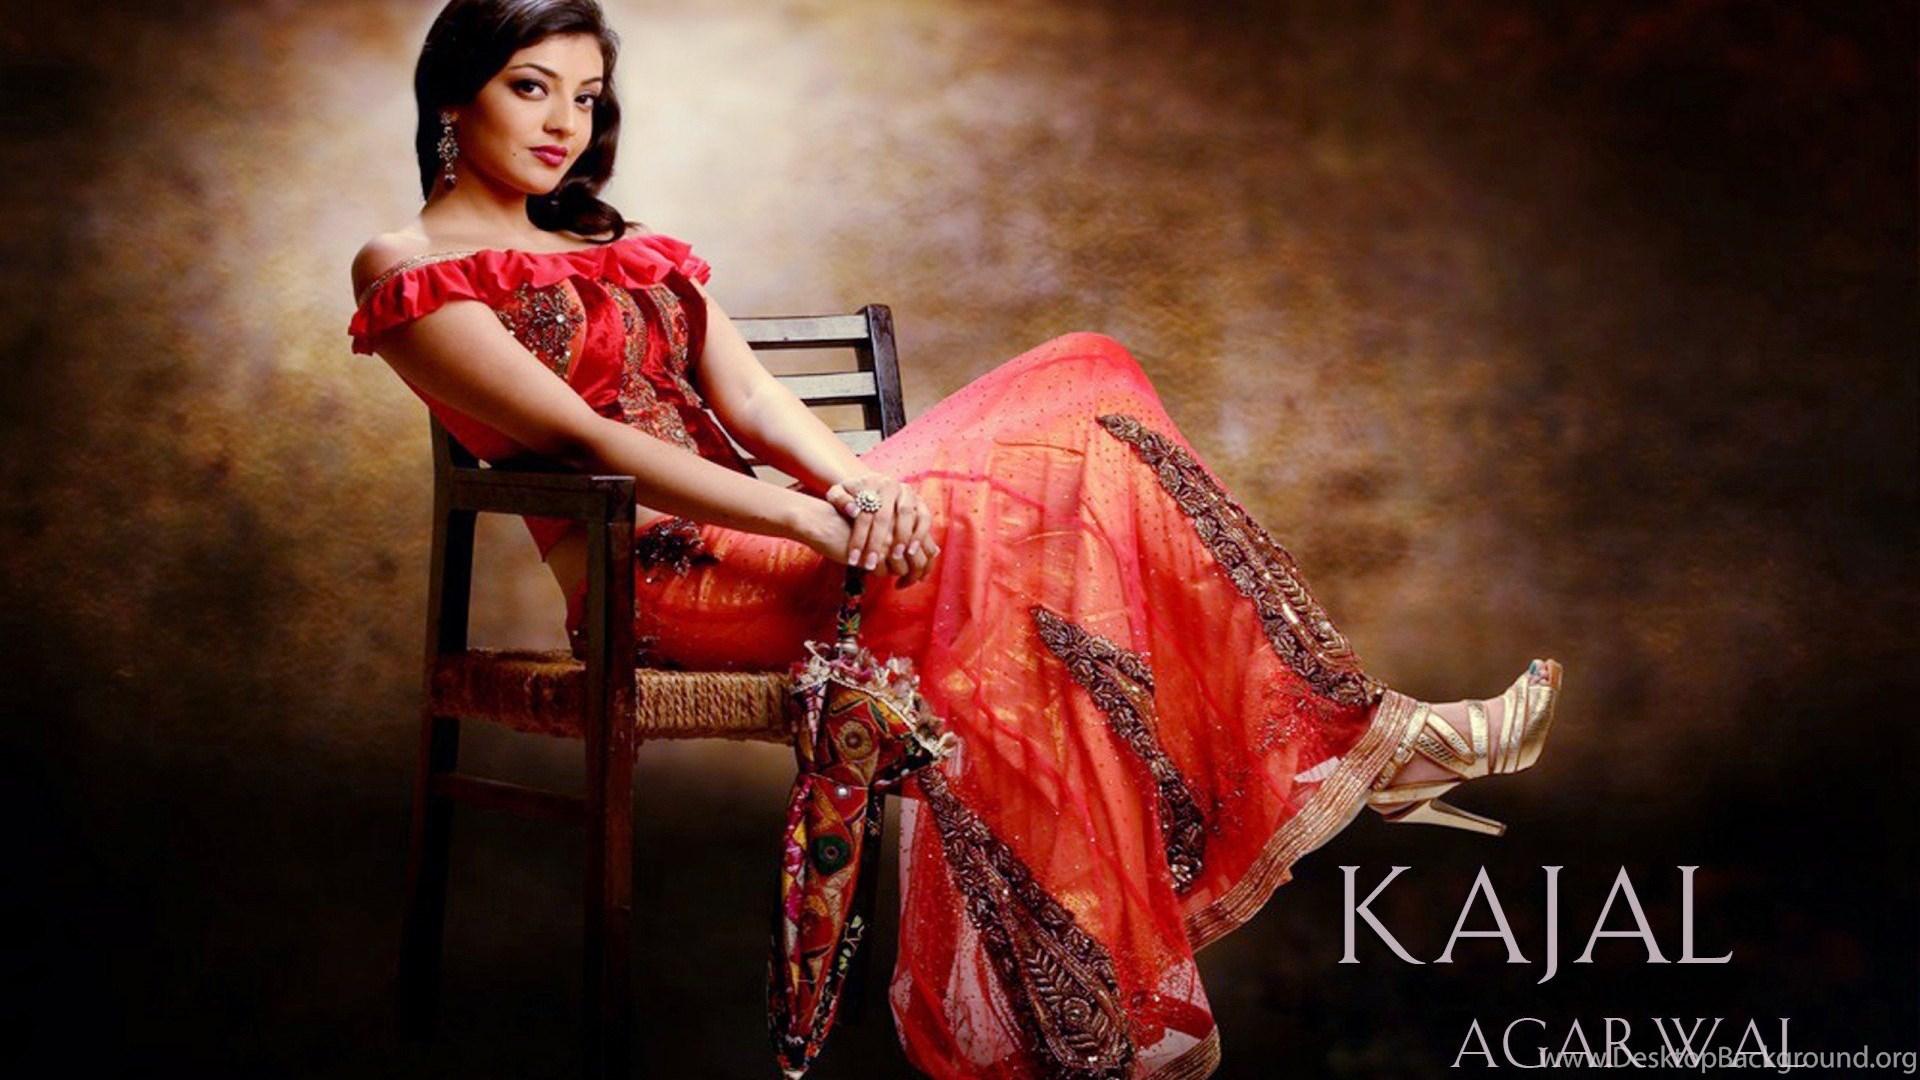 Kajal Hd Wallpapers Hot Sexy Kajal Agarwal Bold Hd Wallpapers Download Kajal Agarwal Hot Sexy 214660 Hd Wallpaper Backgrounds Download